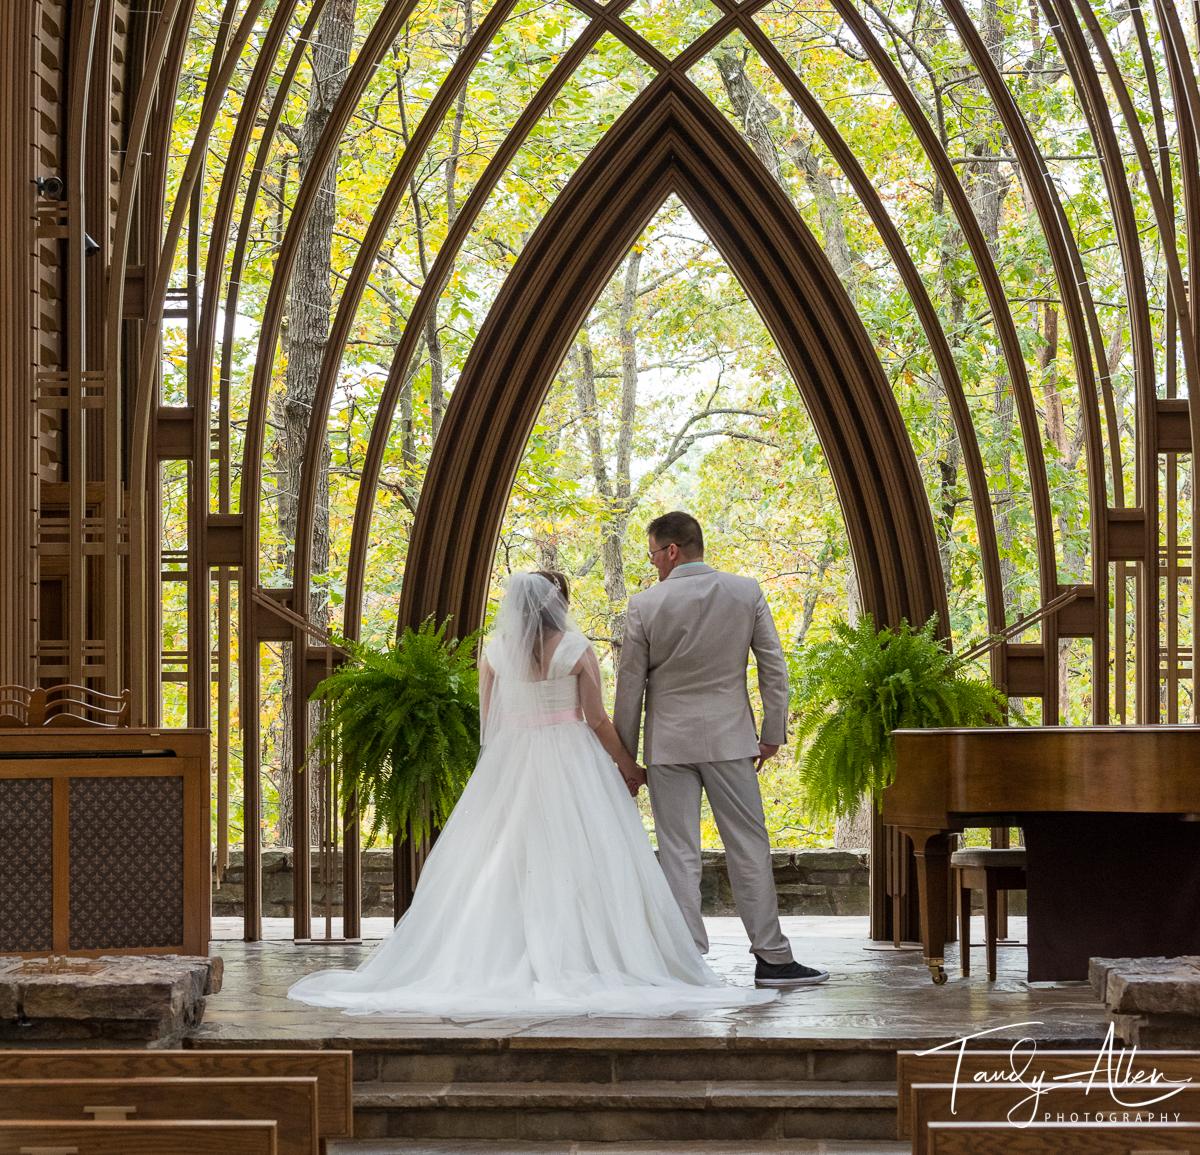 Wedding Ceremony Church View